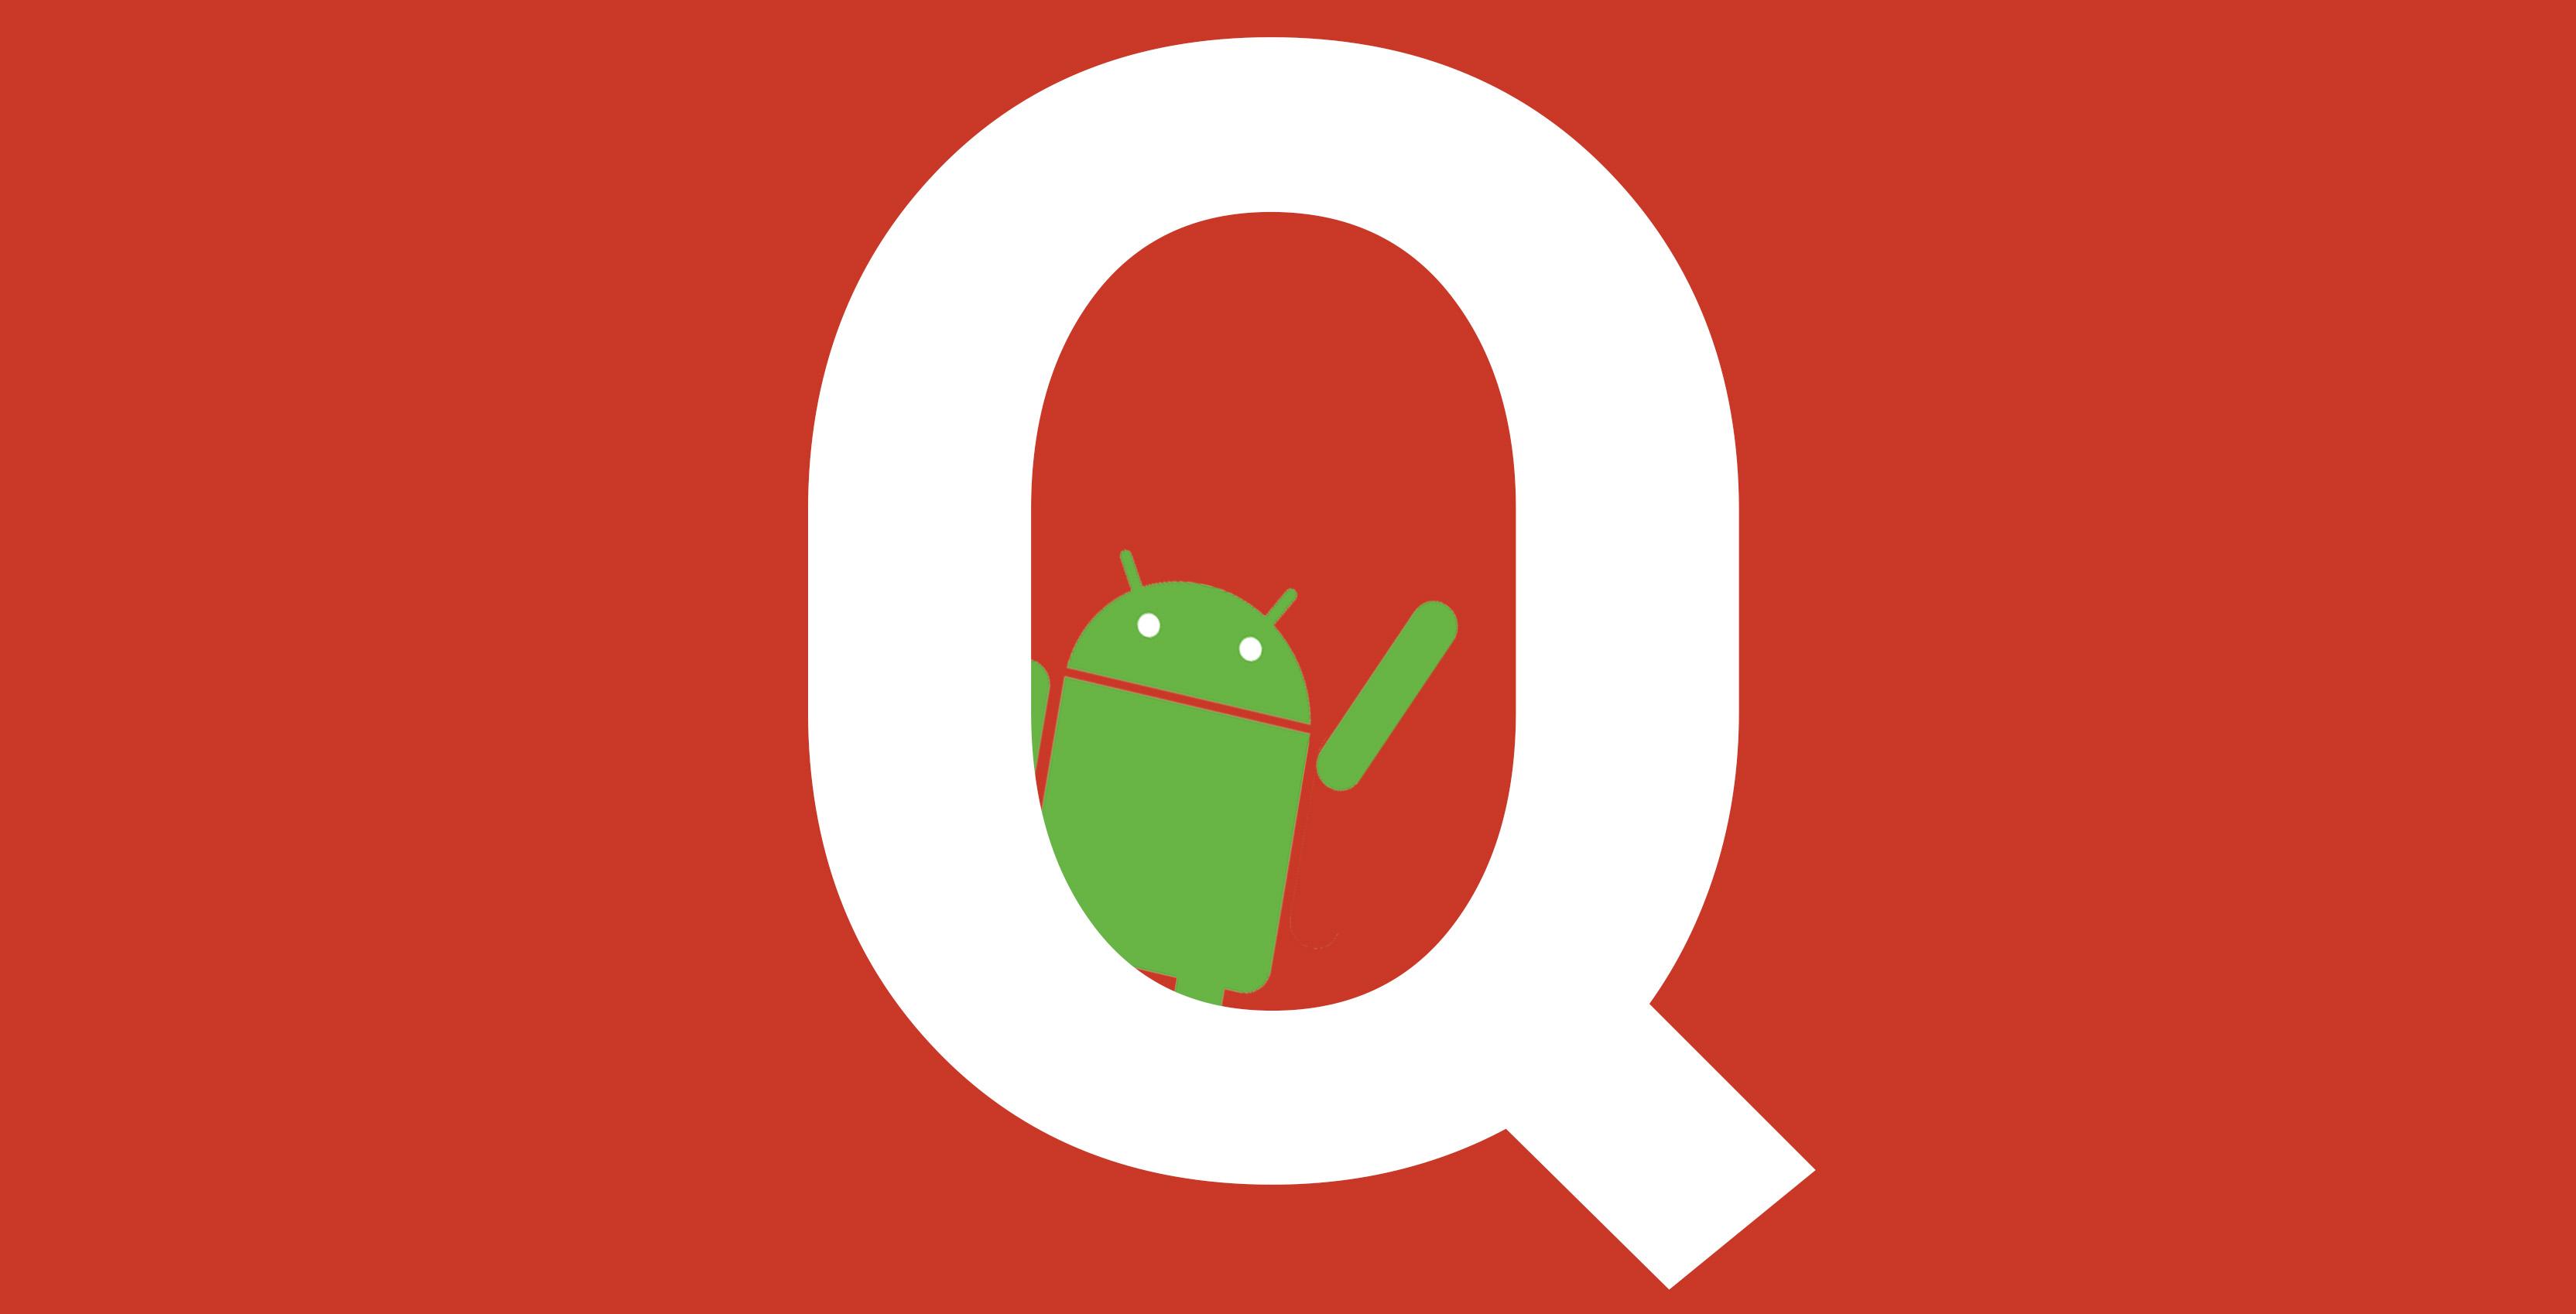 fe2b1970c7b0a أعلنت شركة جوجل خلال العام الماضى، عن توفير النسخ التجريبية من Android Pie  لـ 7 شركات أخرى غيرها، لطرح نظام التشغيل الجديد على بعض هواتفهم الذكية، لكن  ...